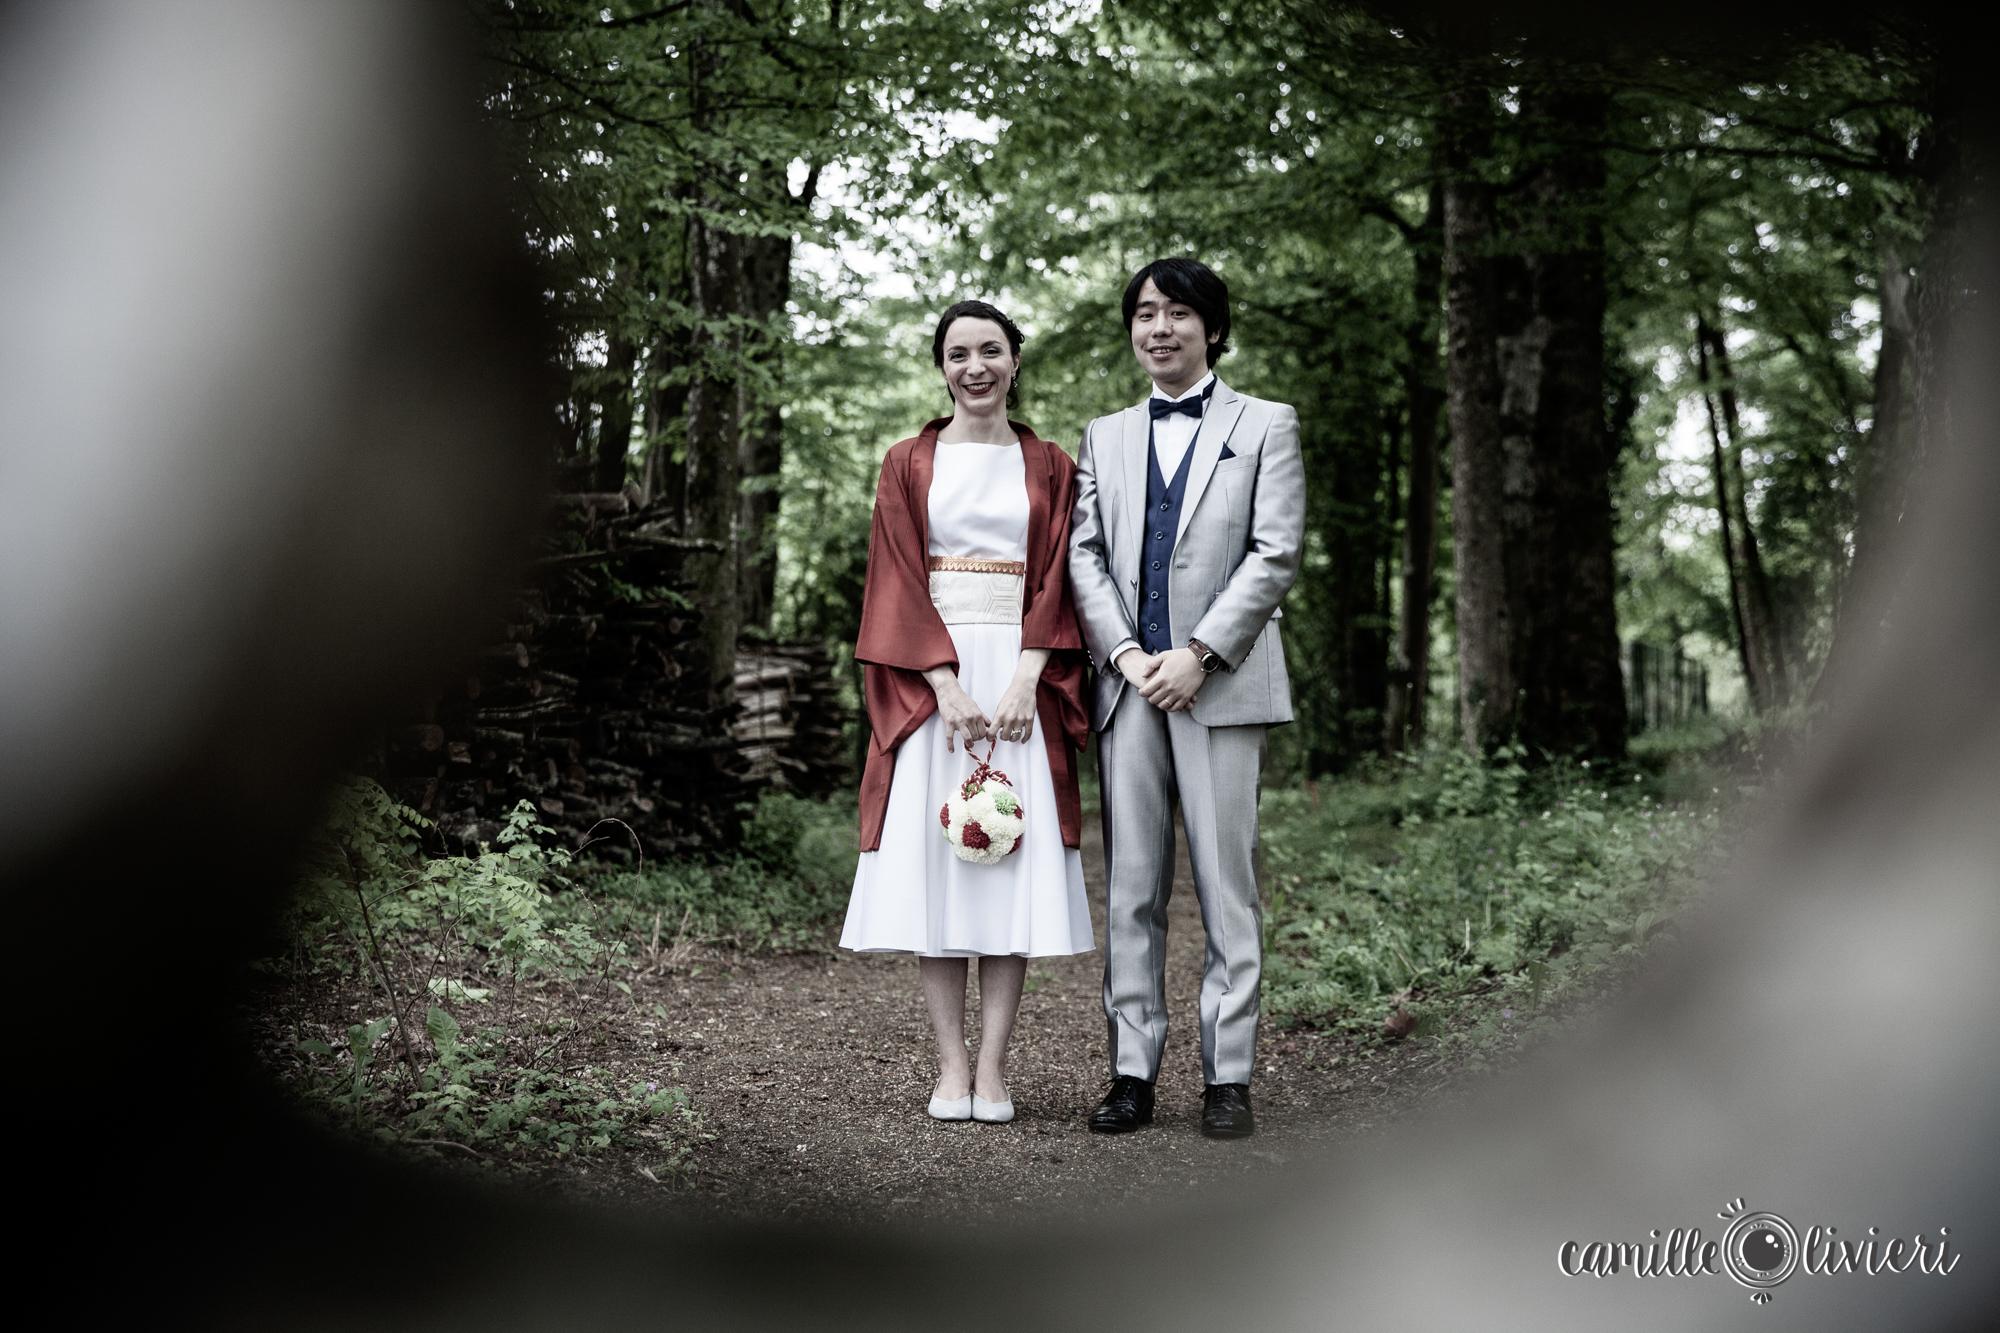 photographe_grenoble_mariage-camille-olivieri-37